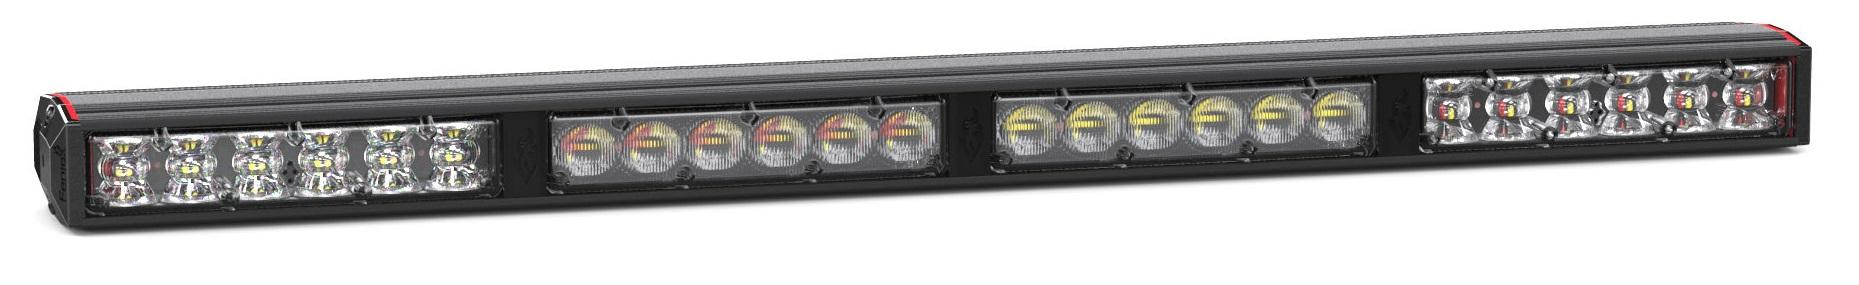 http://cdn1.bigcommerce.com/server1000/sjbkl/product_images/uploaded_images/feniex-fusion-400-lightstick-2-short.jpg?t=1468194689